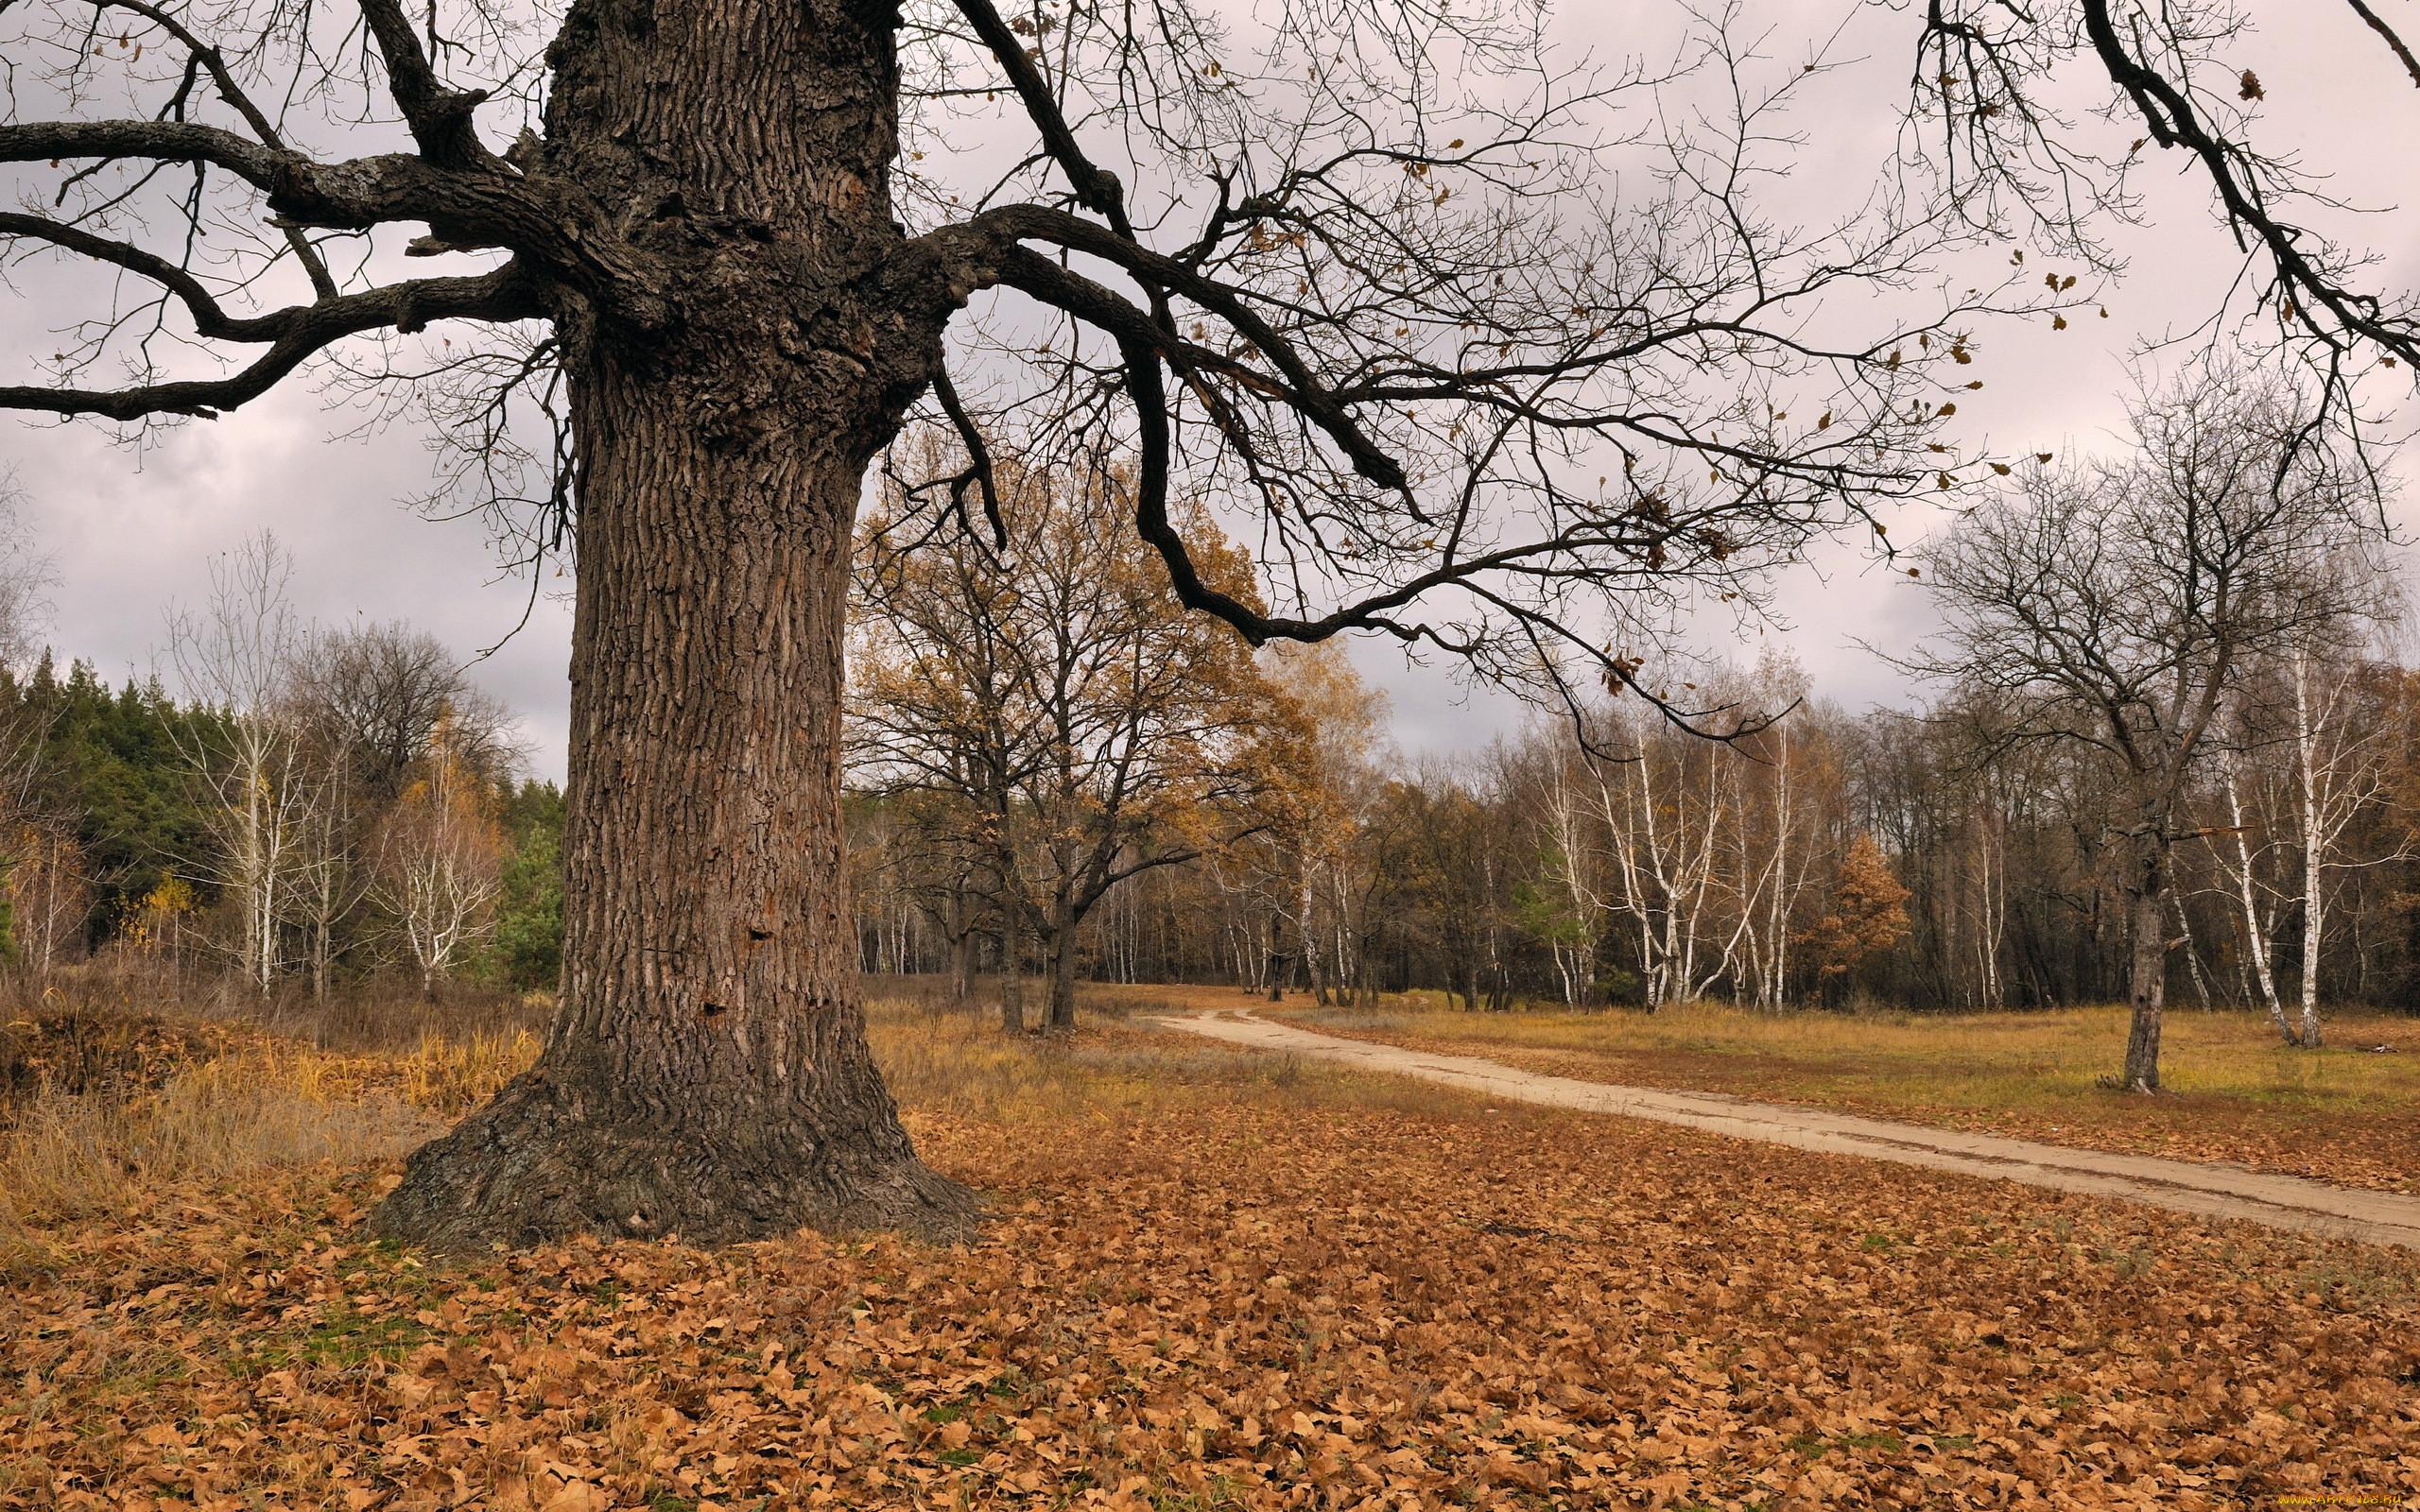 Домашние растения фото и названия мини деревья под